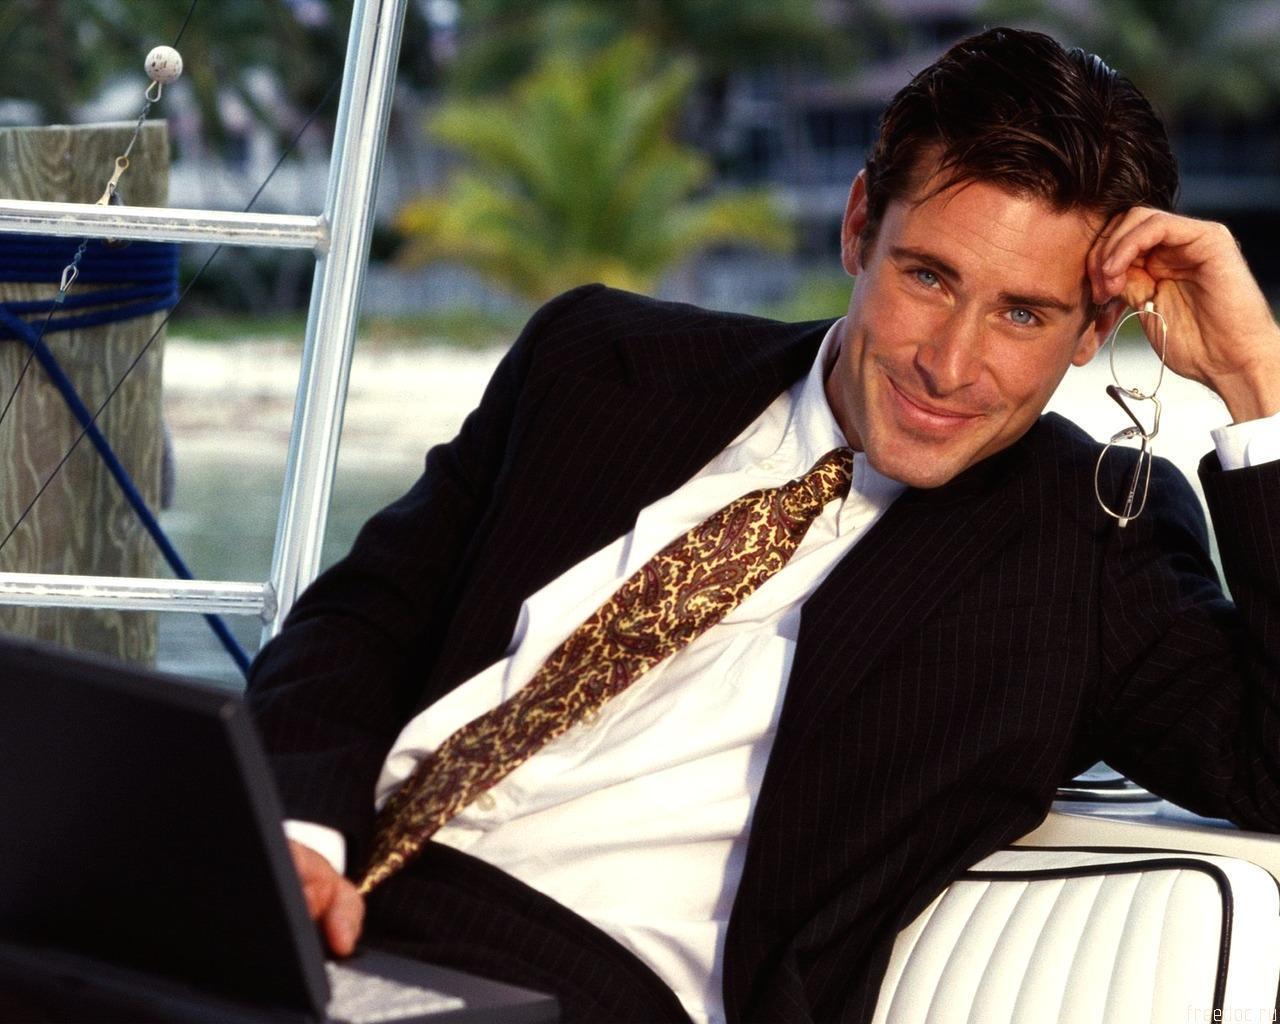 Топ 7 типов мужчин, с которыми нужно завести роман - фото №5